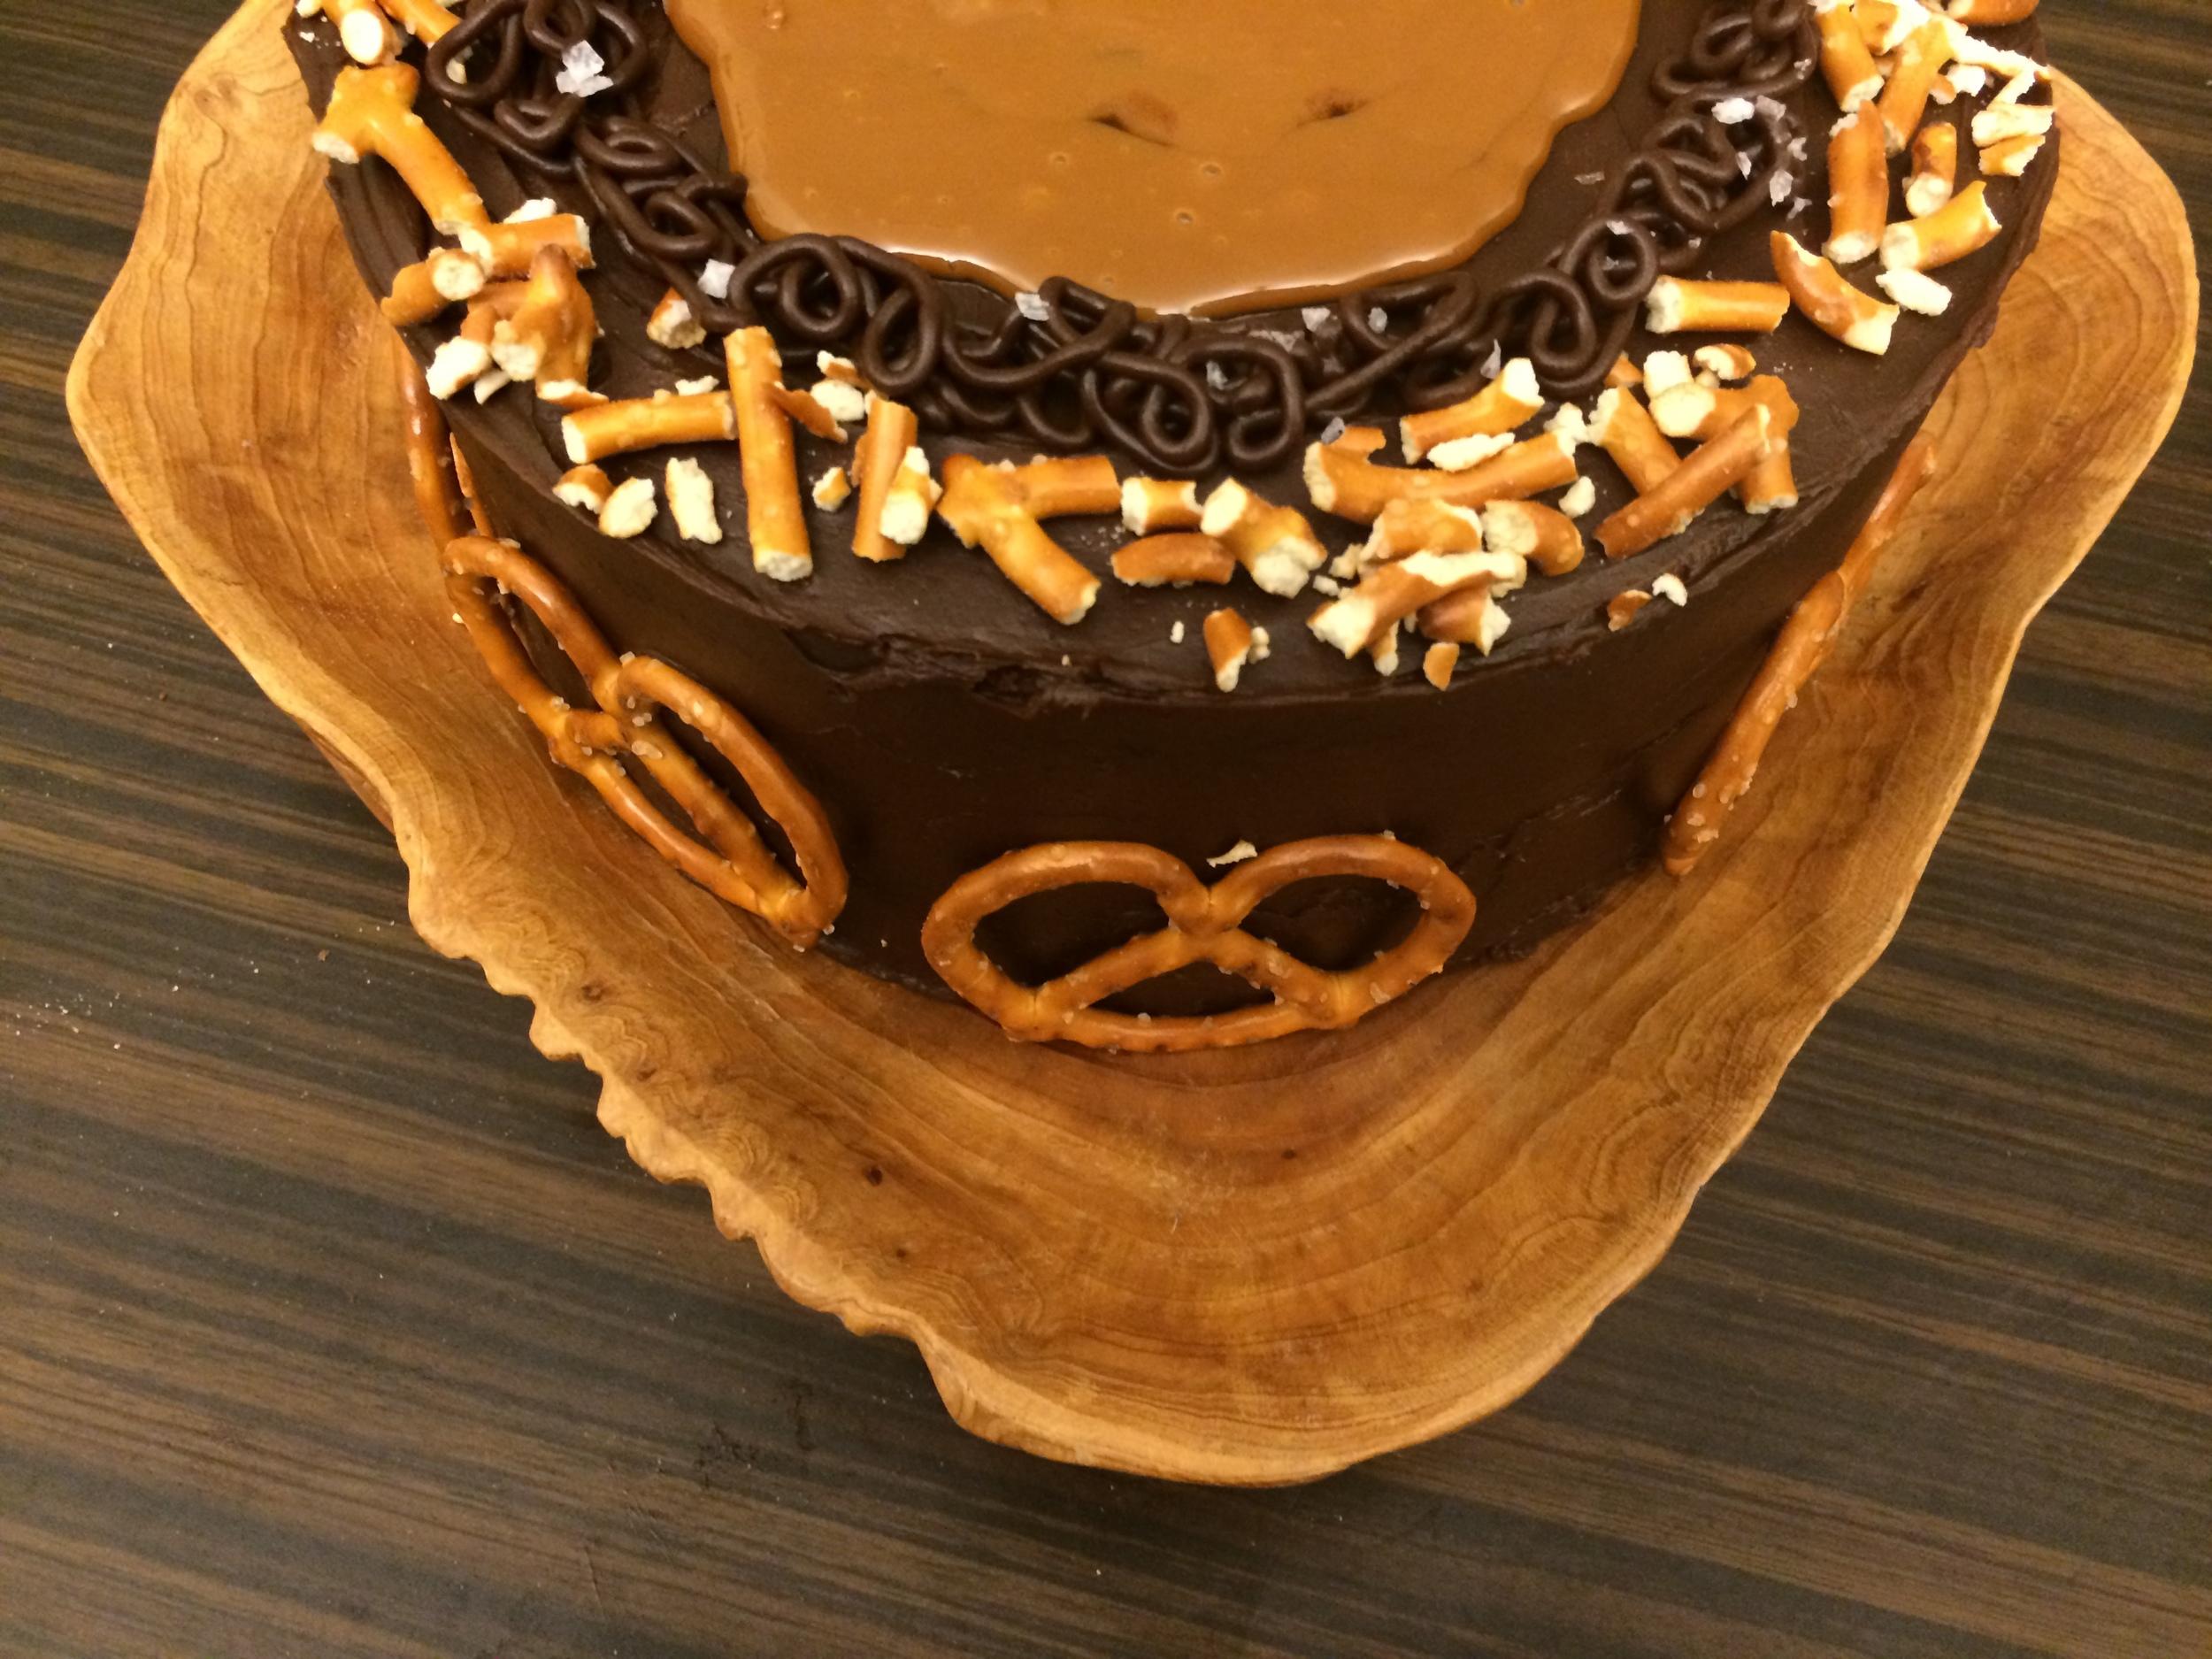 salted dark chocolate and caramel + pretzel cake